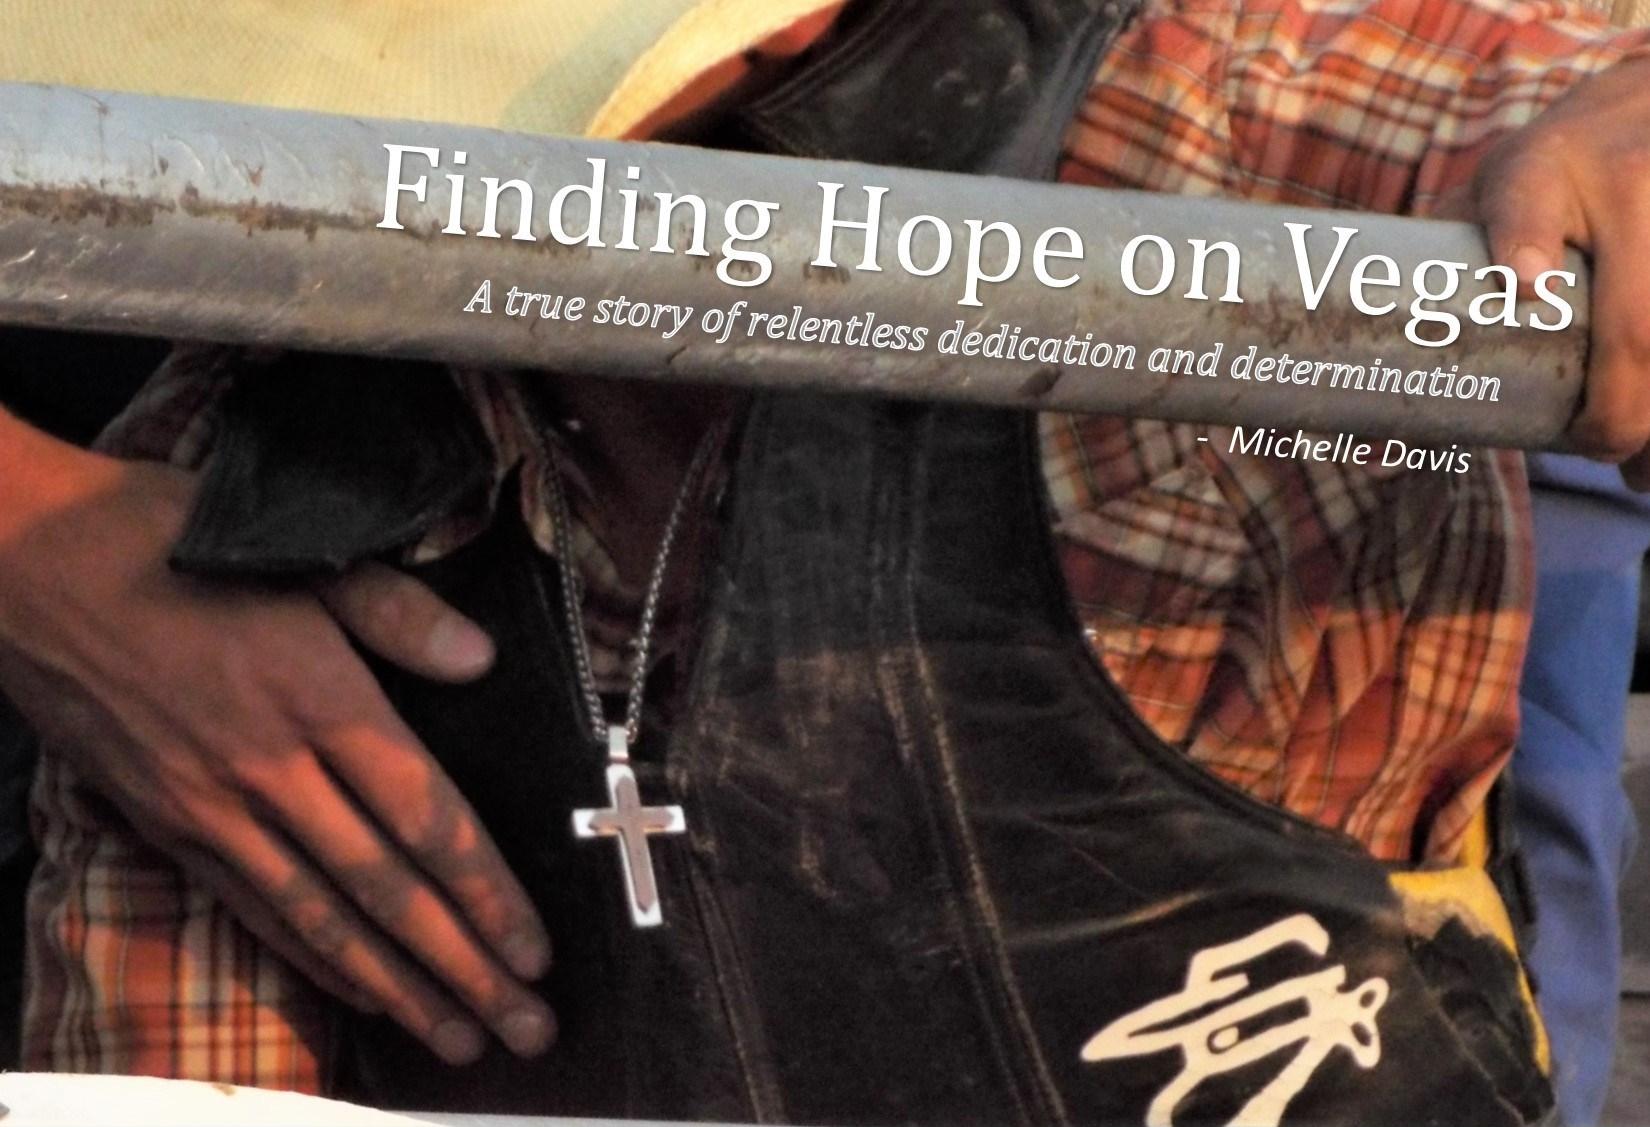 FINDING HOPE ON VEGAS POSTER 4